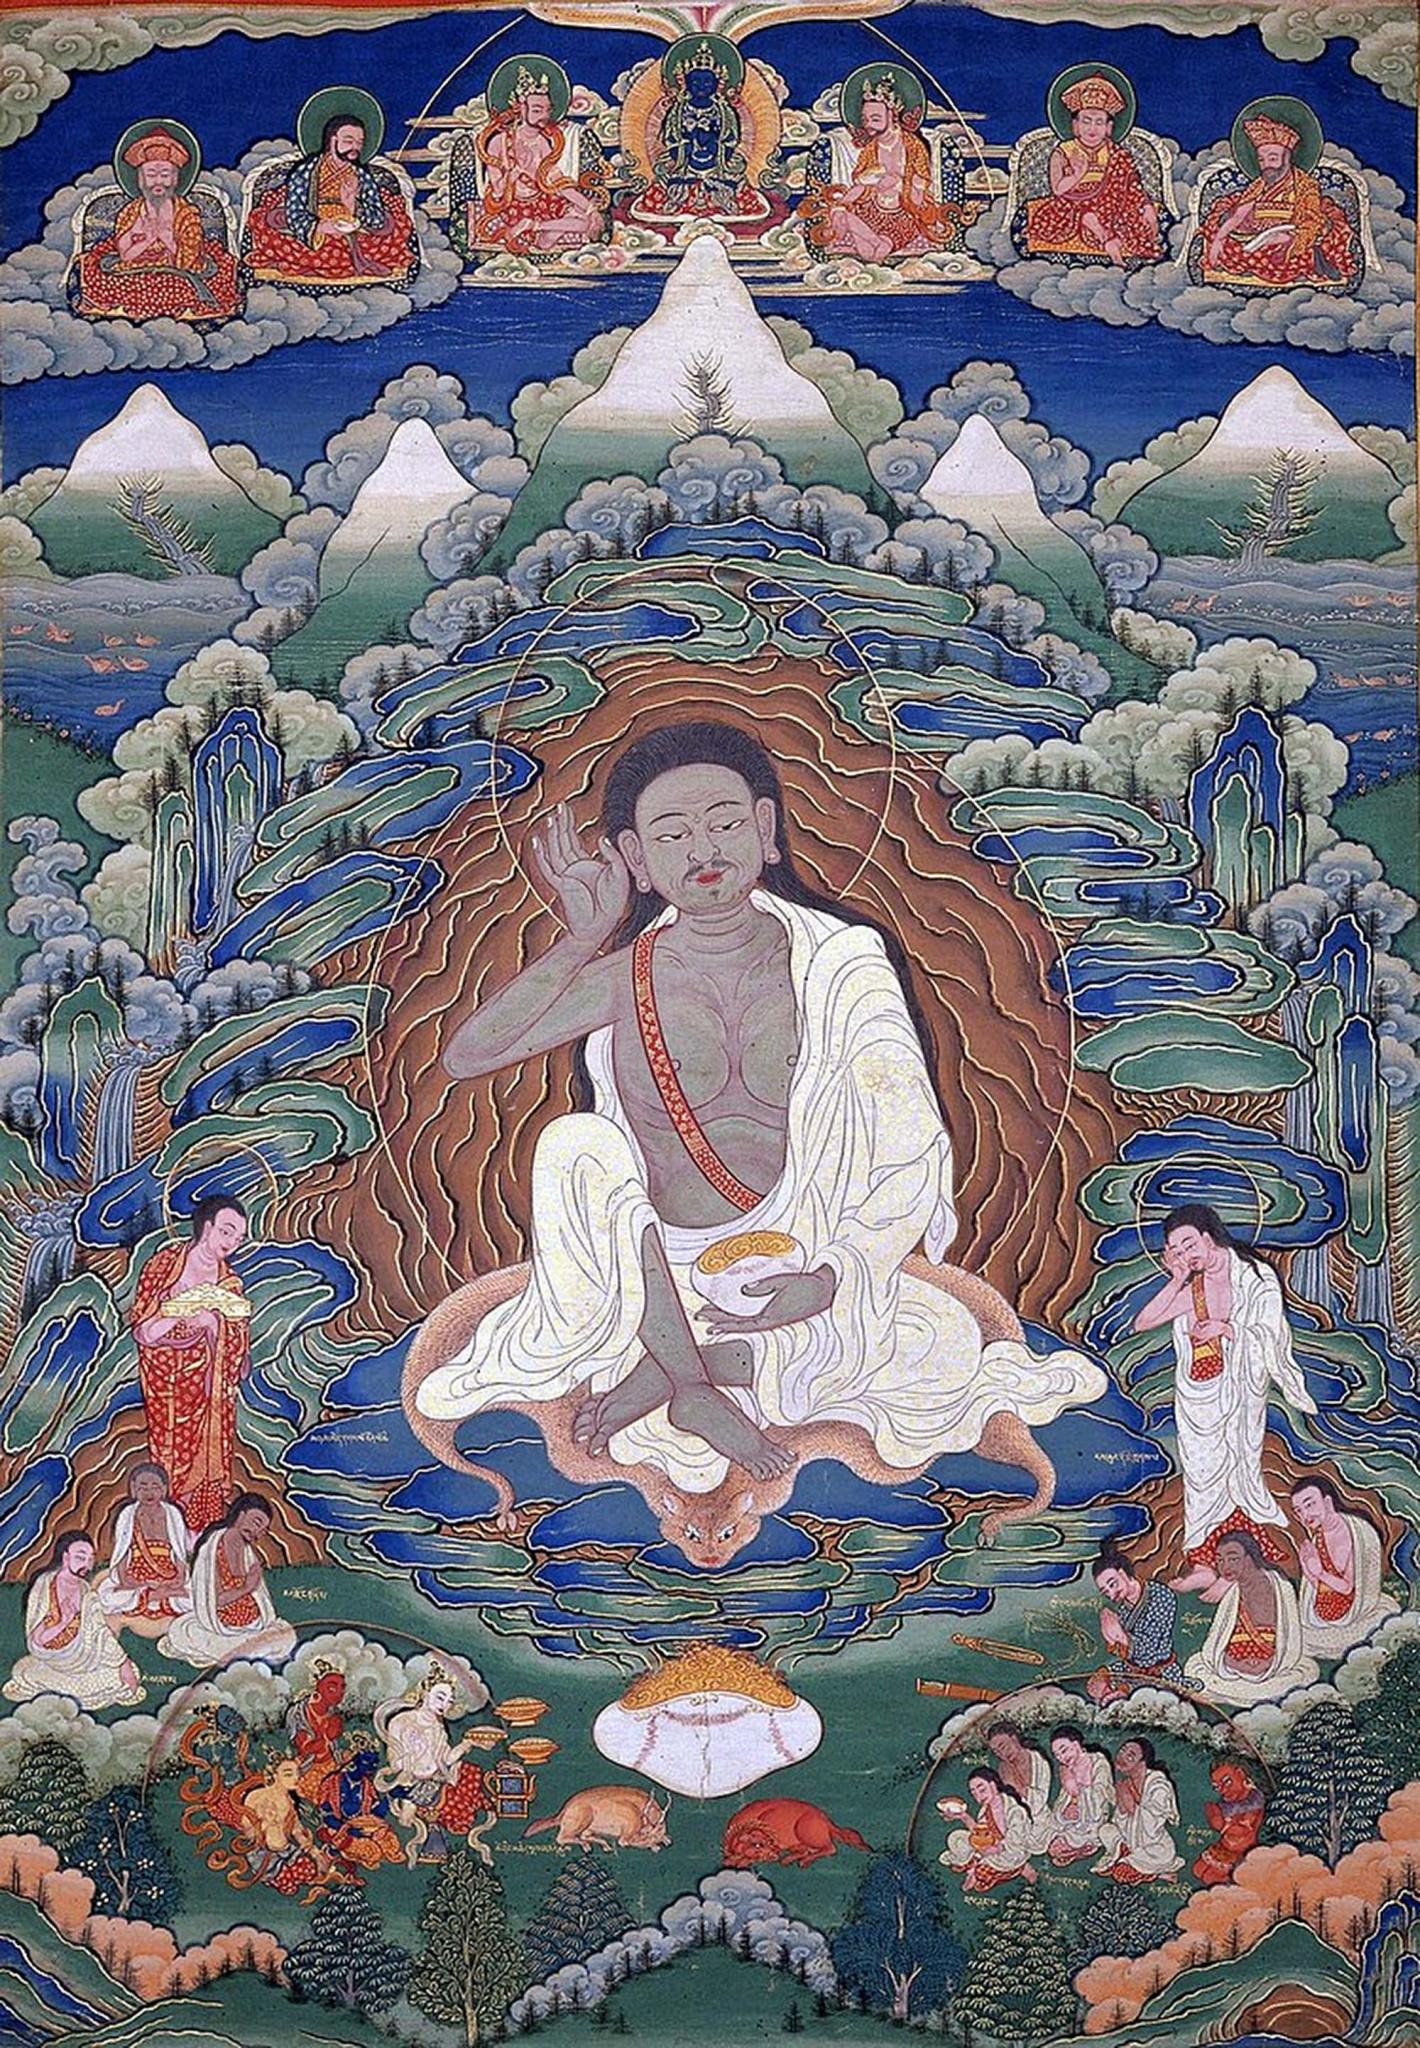 Milarepa, Thangka from Bhutan